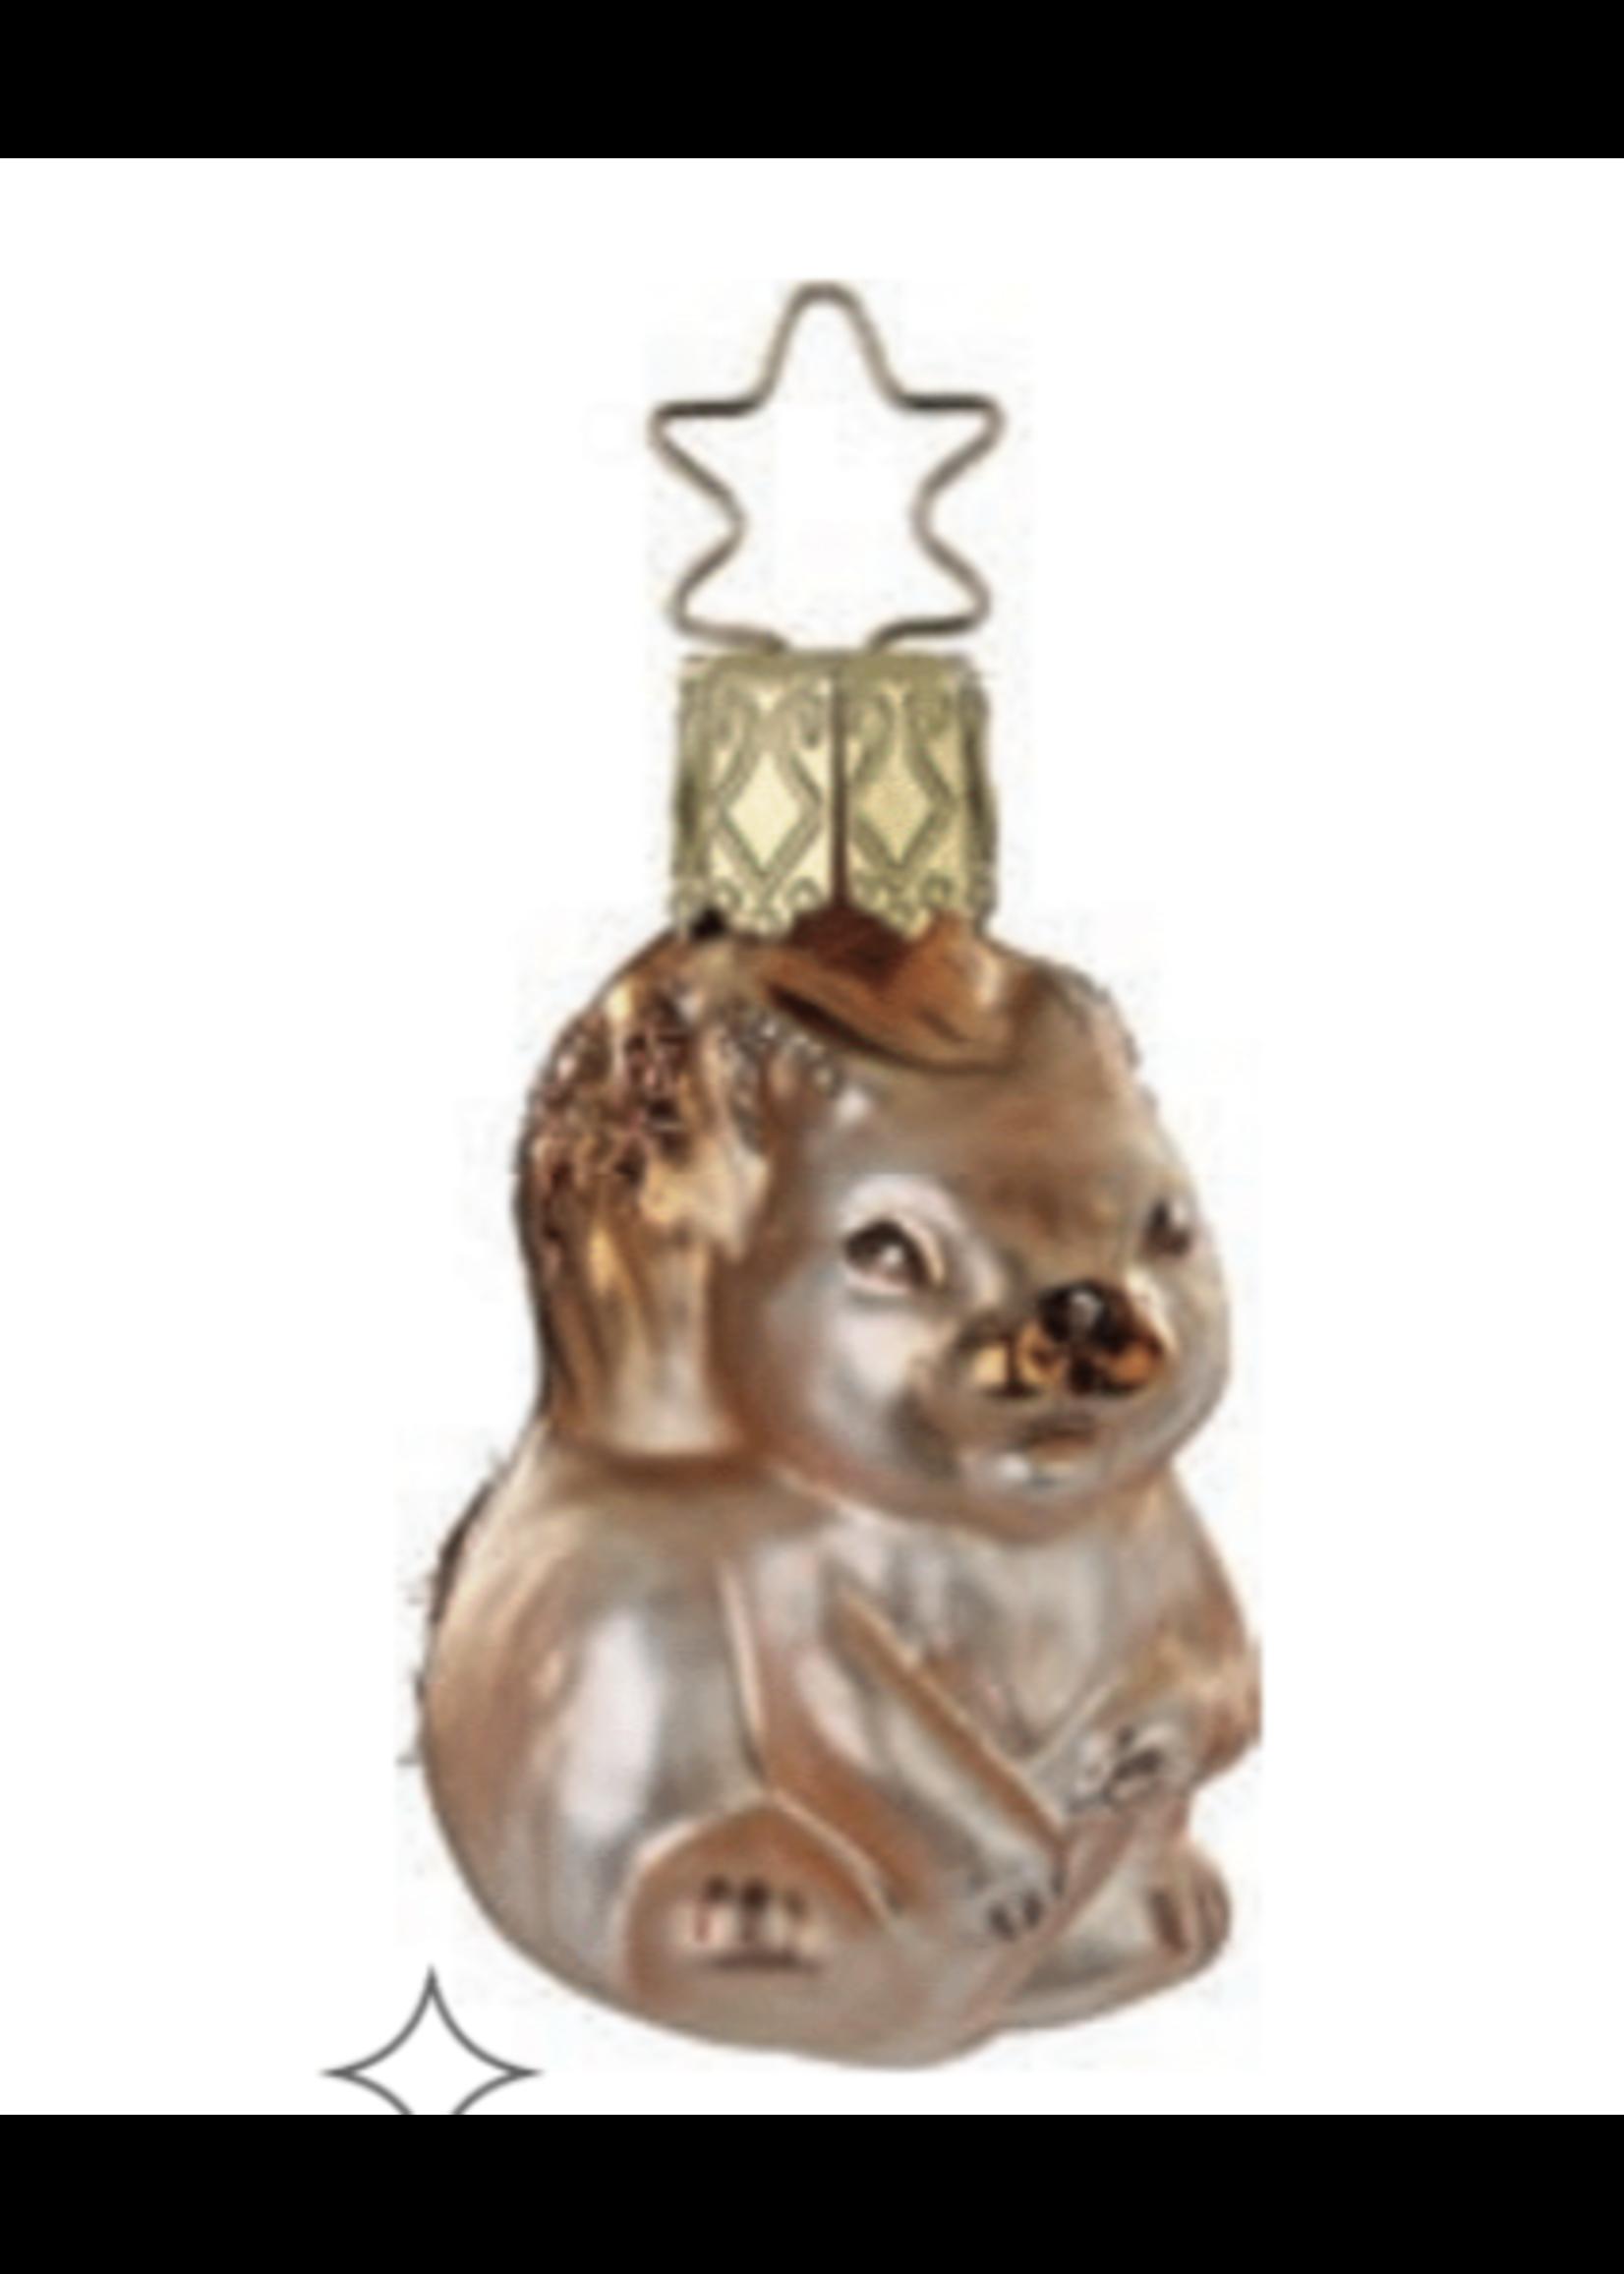 Ornament - Baby Squirrel